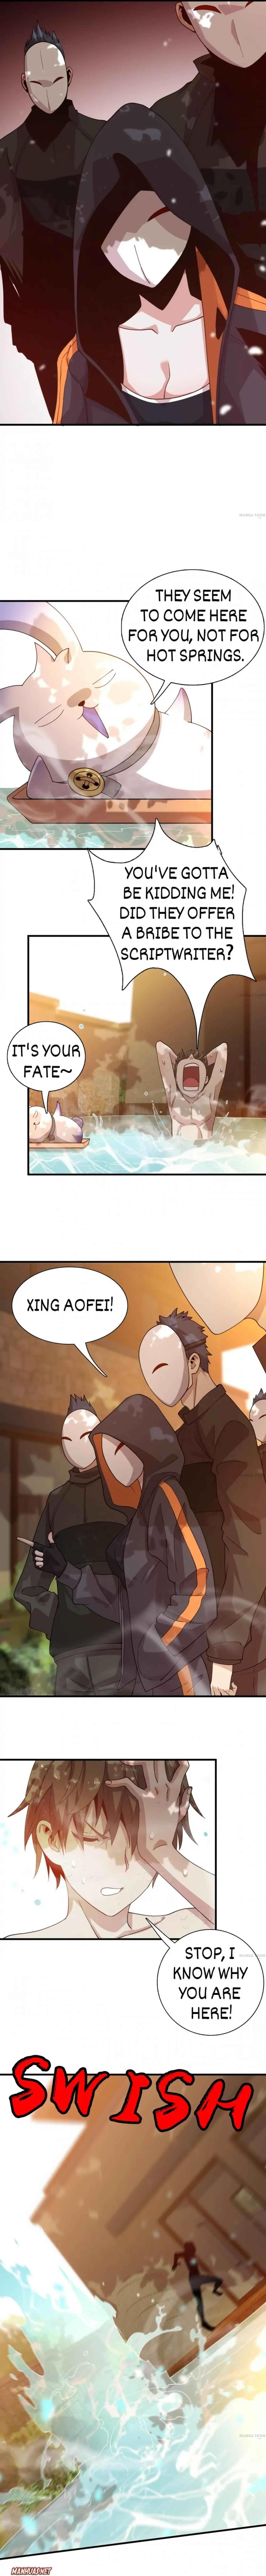 Rebirth Of Legendary Doctor Chapter 53 page 4 - Mangakakalots.com